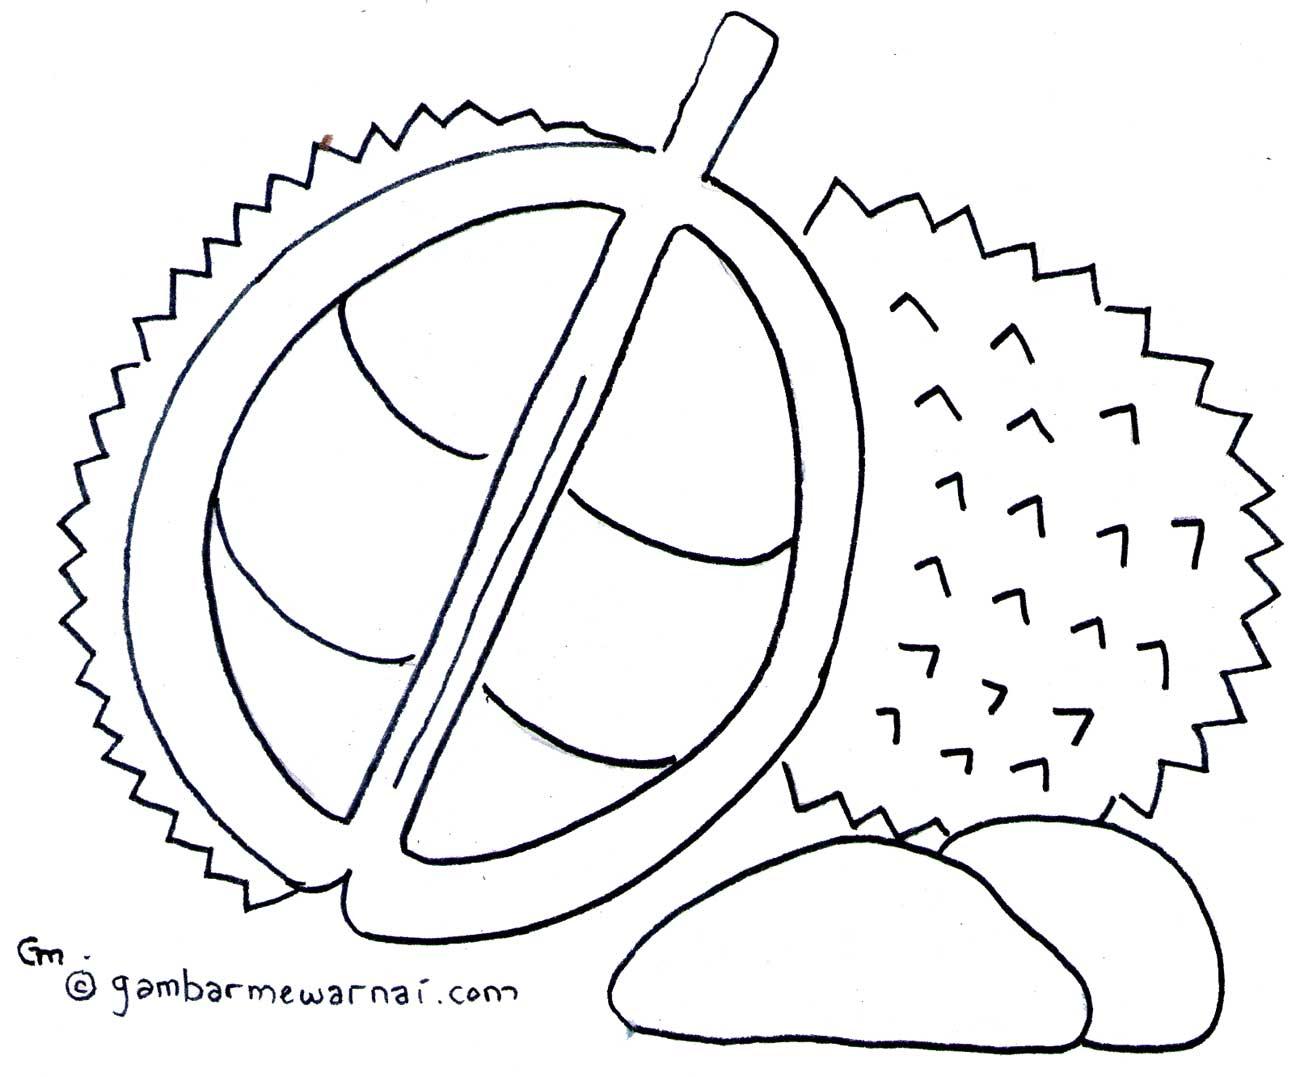 Mewarnai Buah Durian Gambar Mewarnai